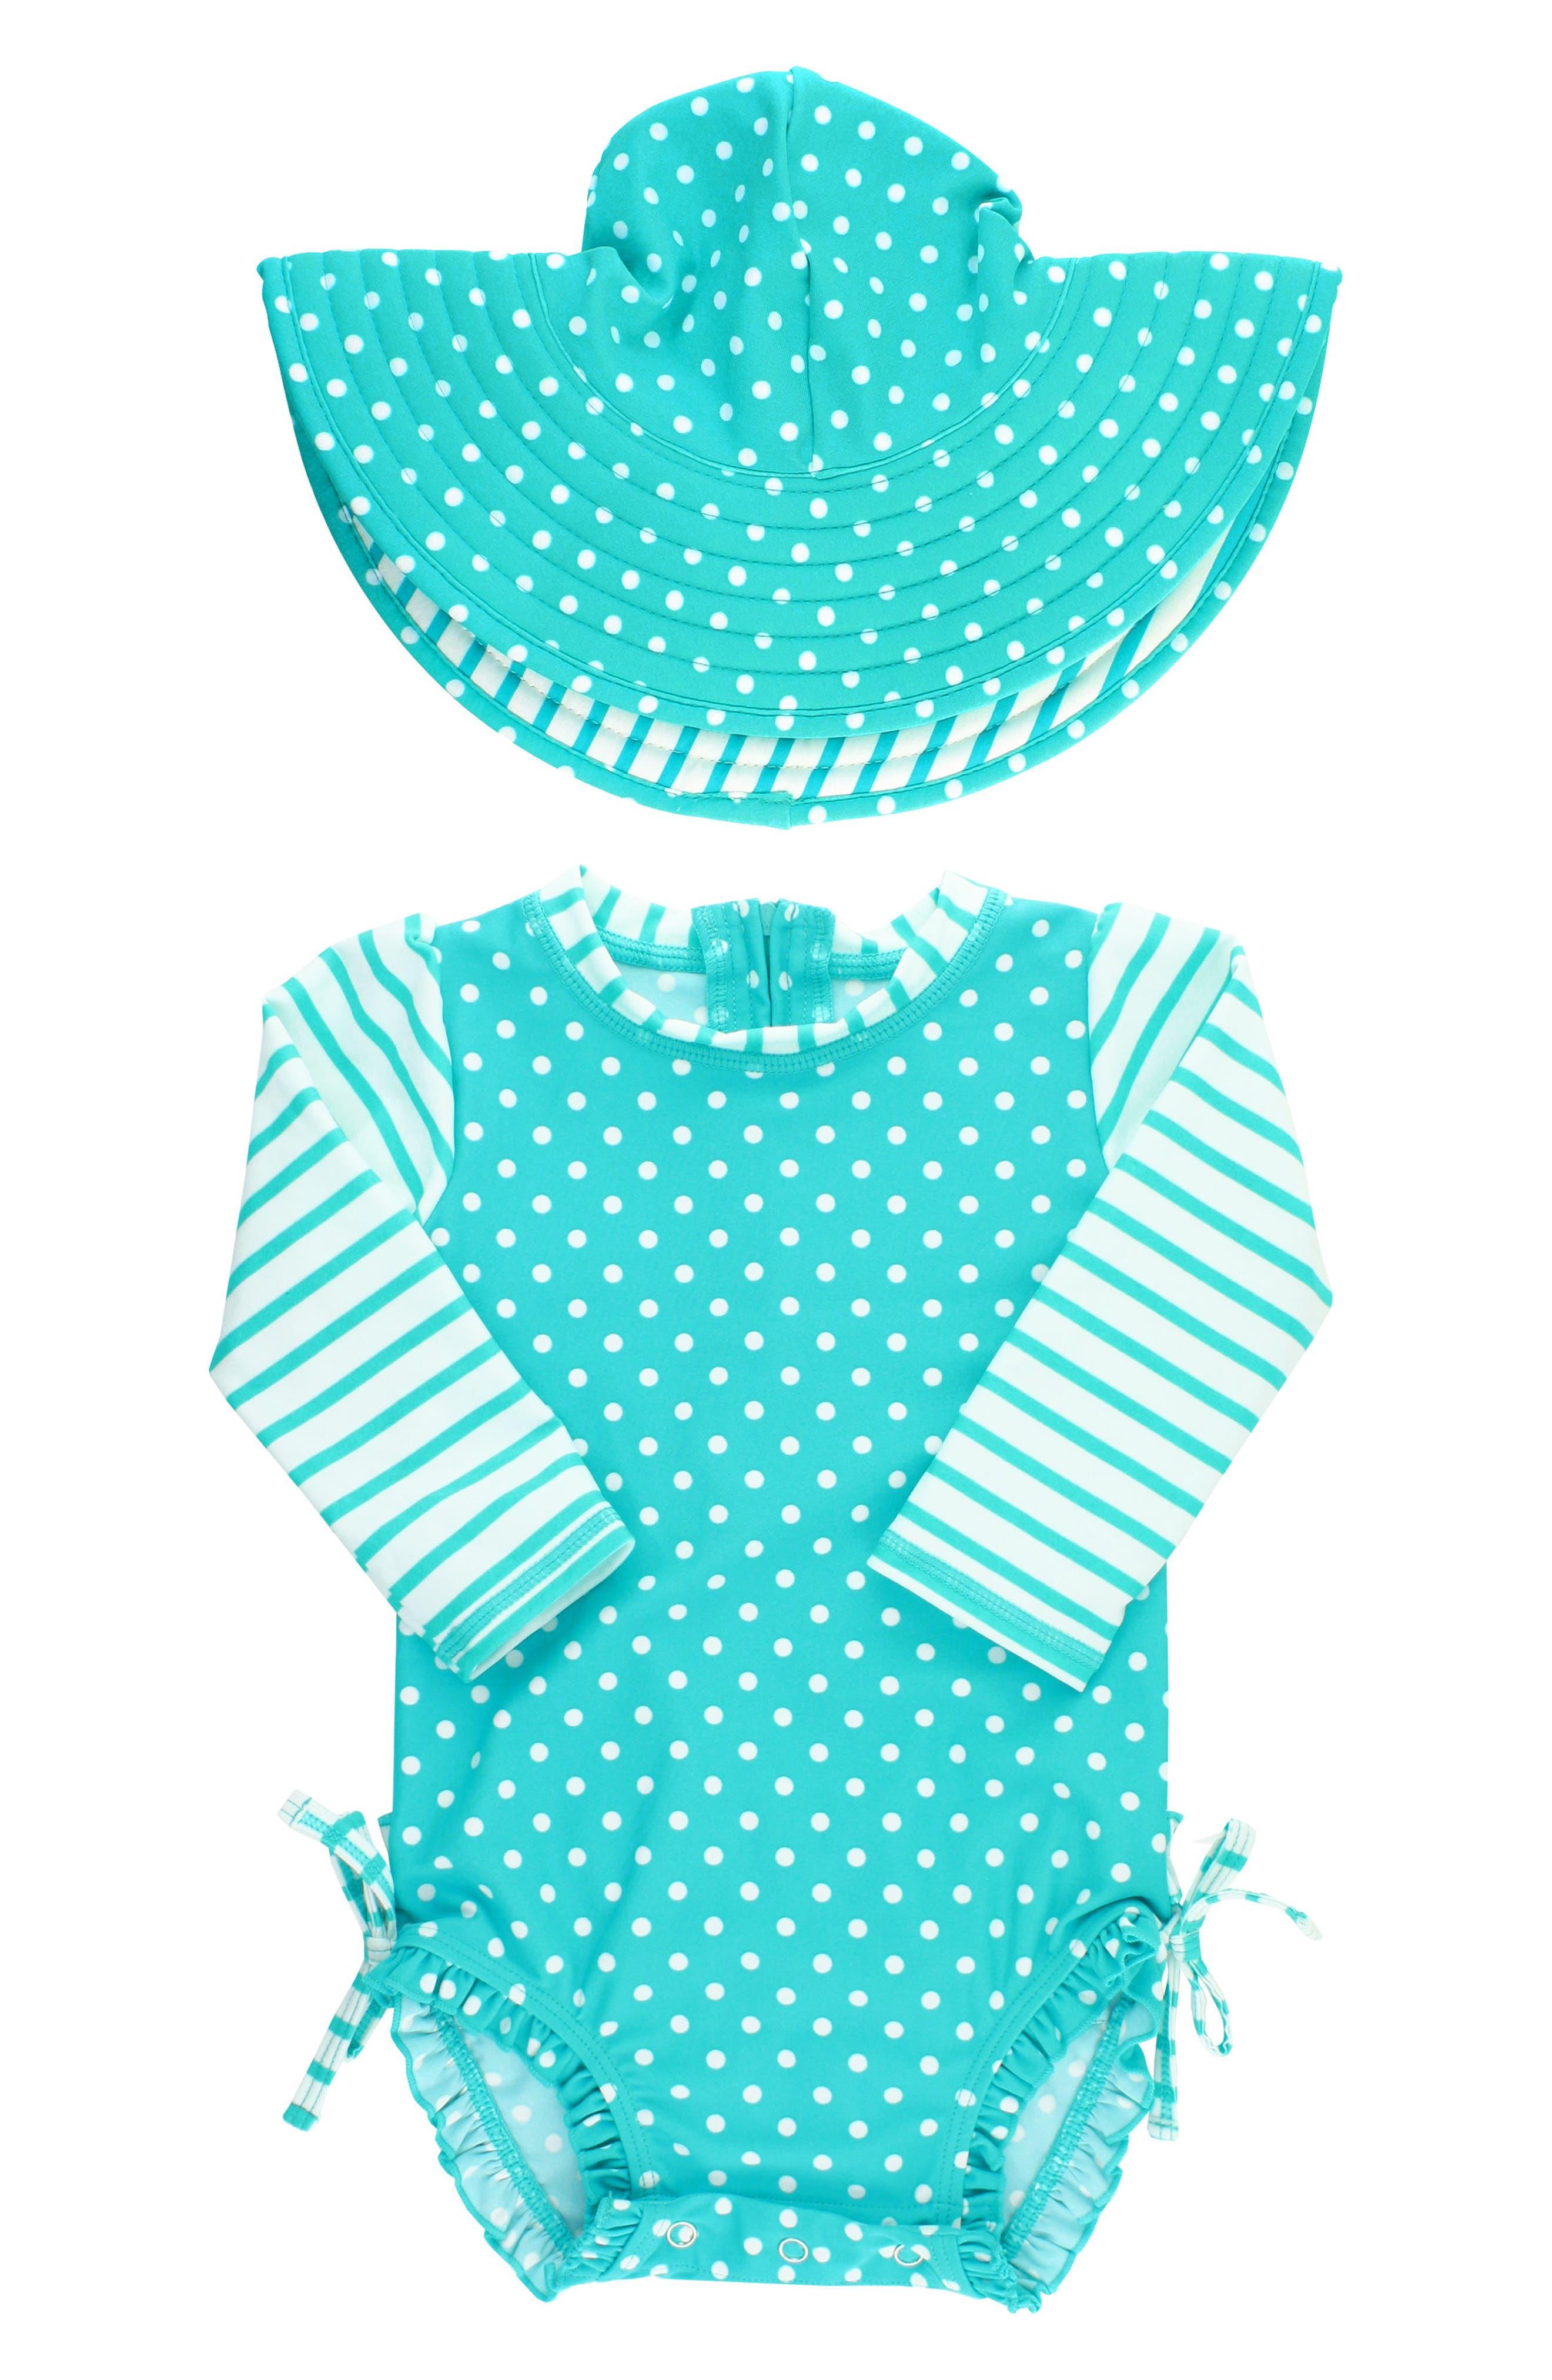 Alternate Image 1 Selected - RuffleButts One-Piece Rashguard Swimsuit & Hat Set (Baby Girls)